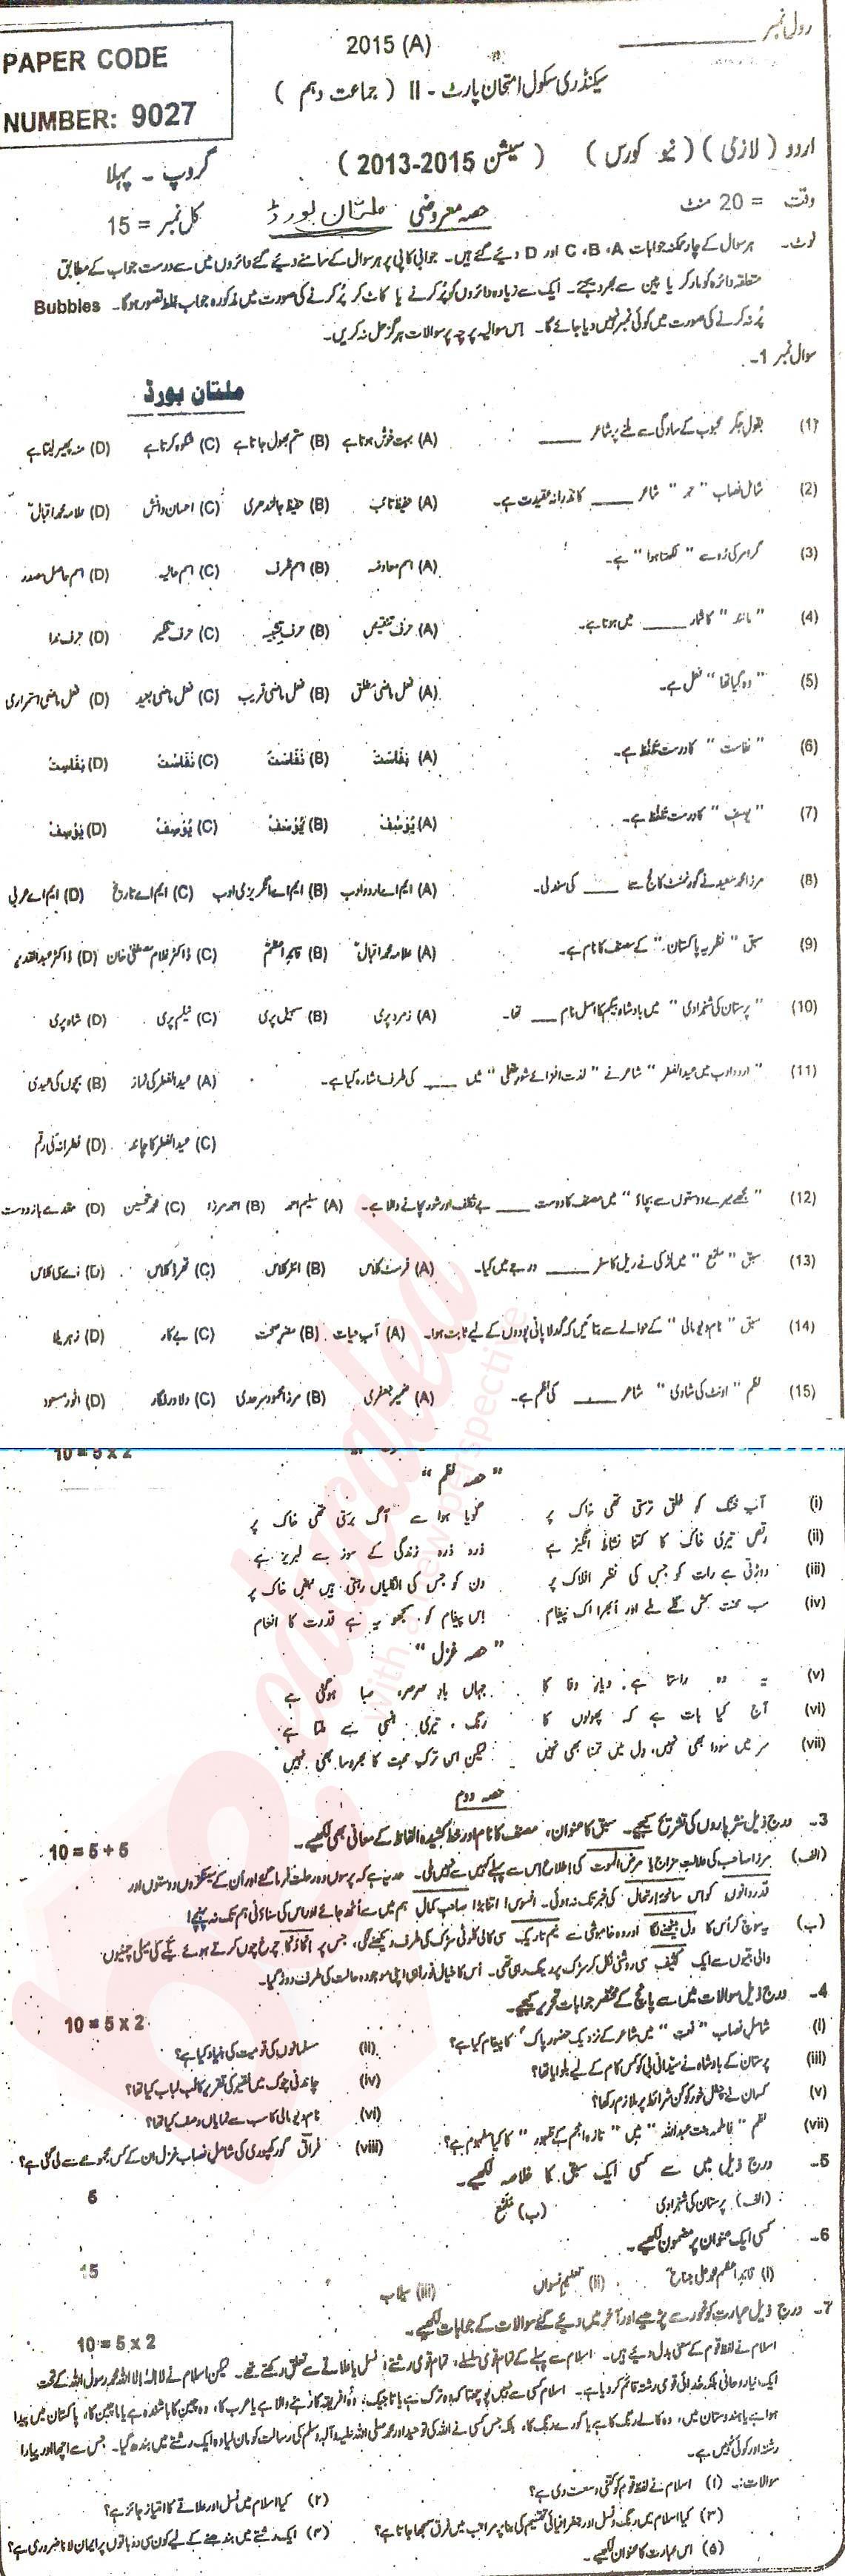 Urdu 10th Class Past Paper Group 1 Bise Multan 2015 Fundraising